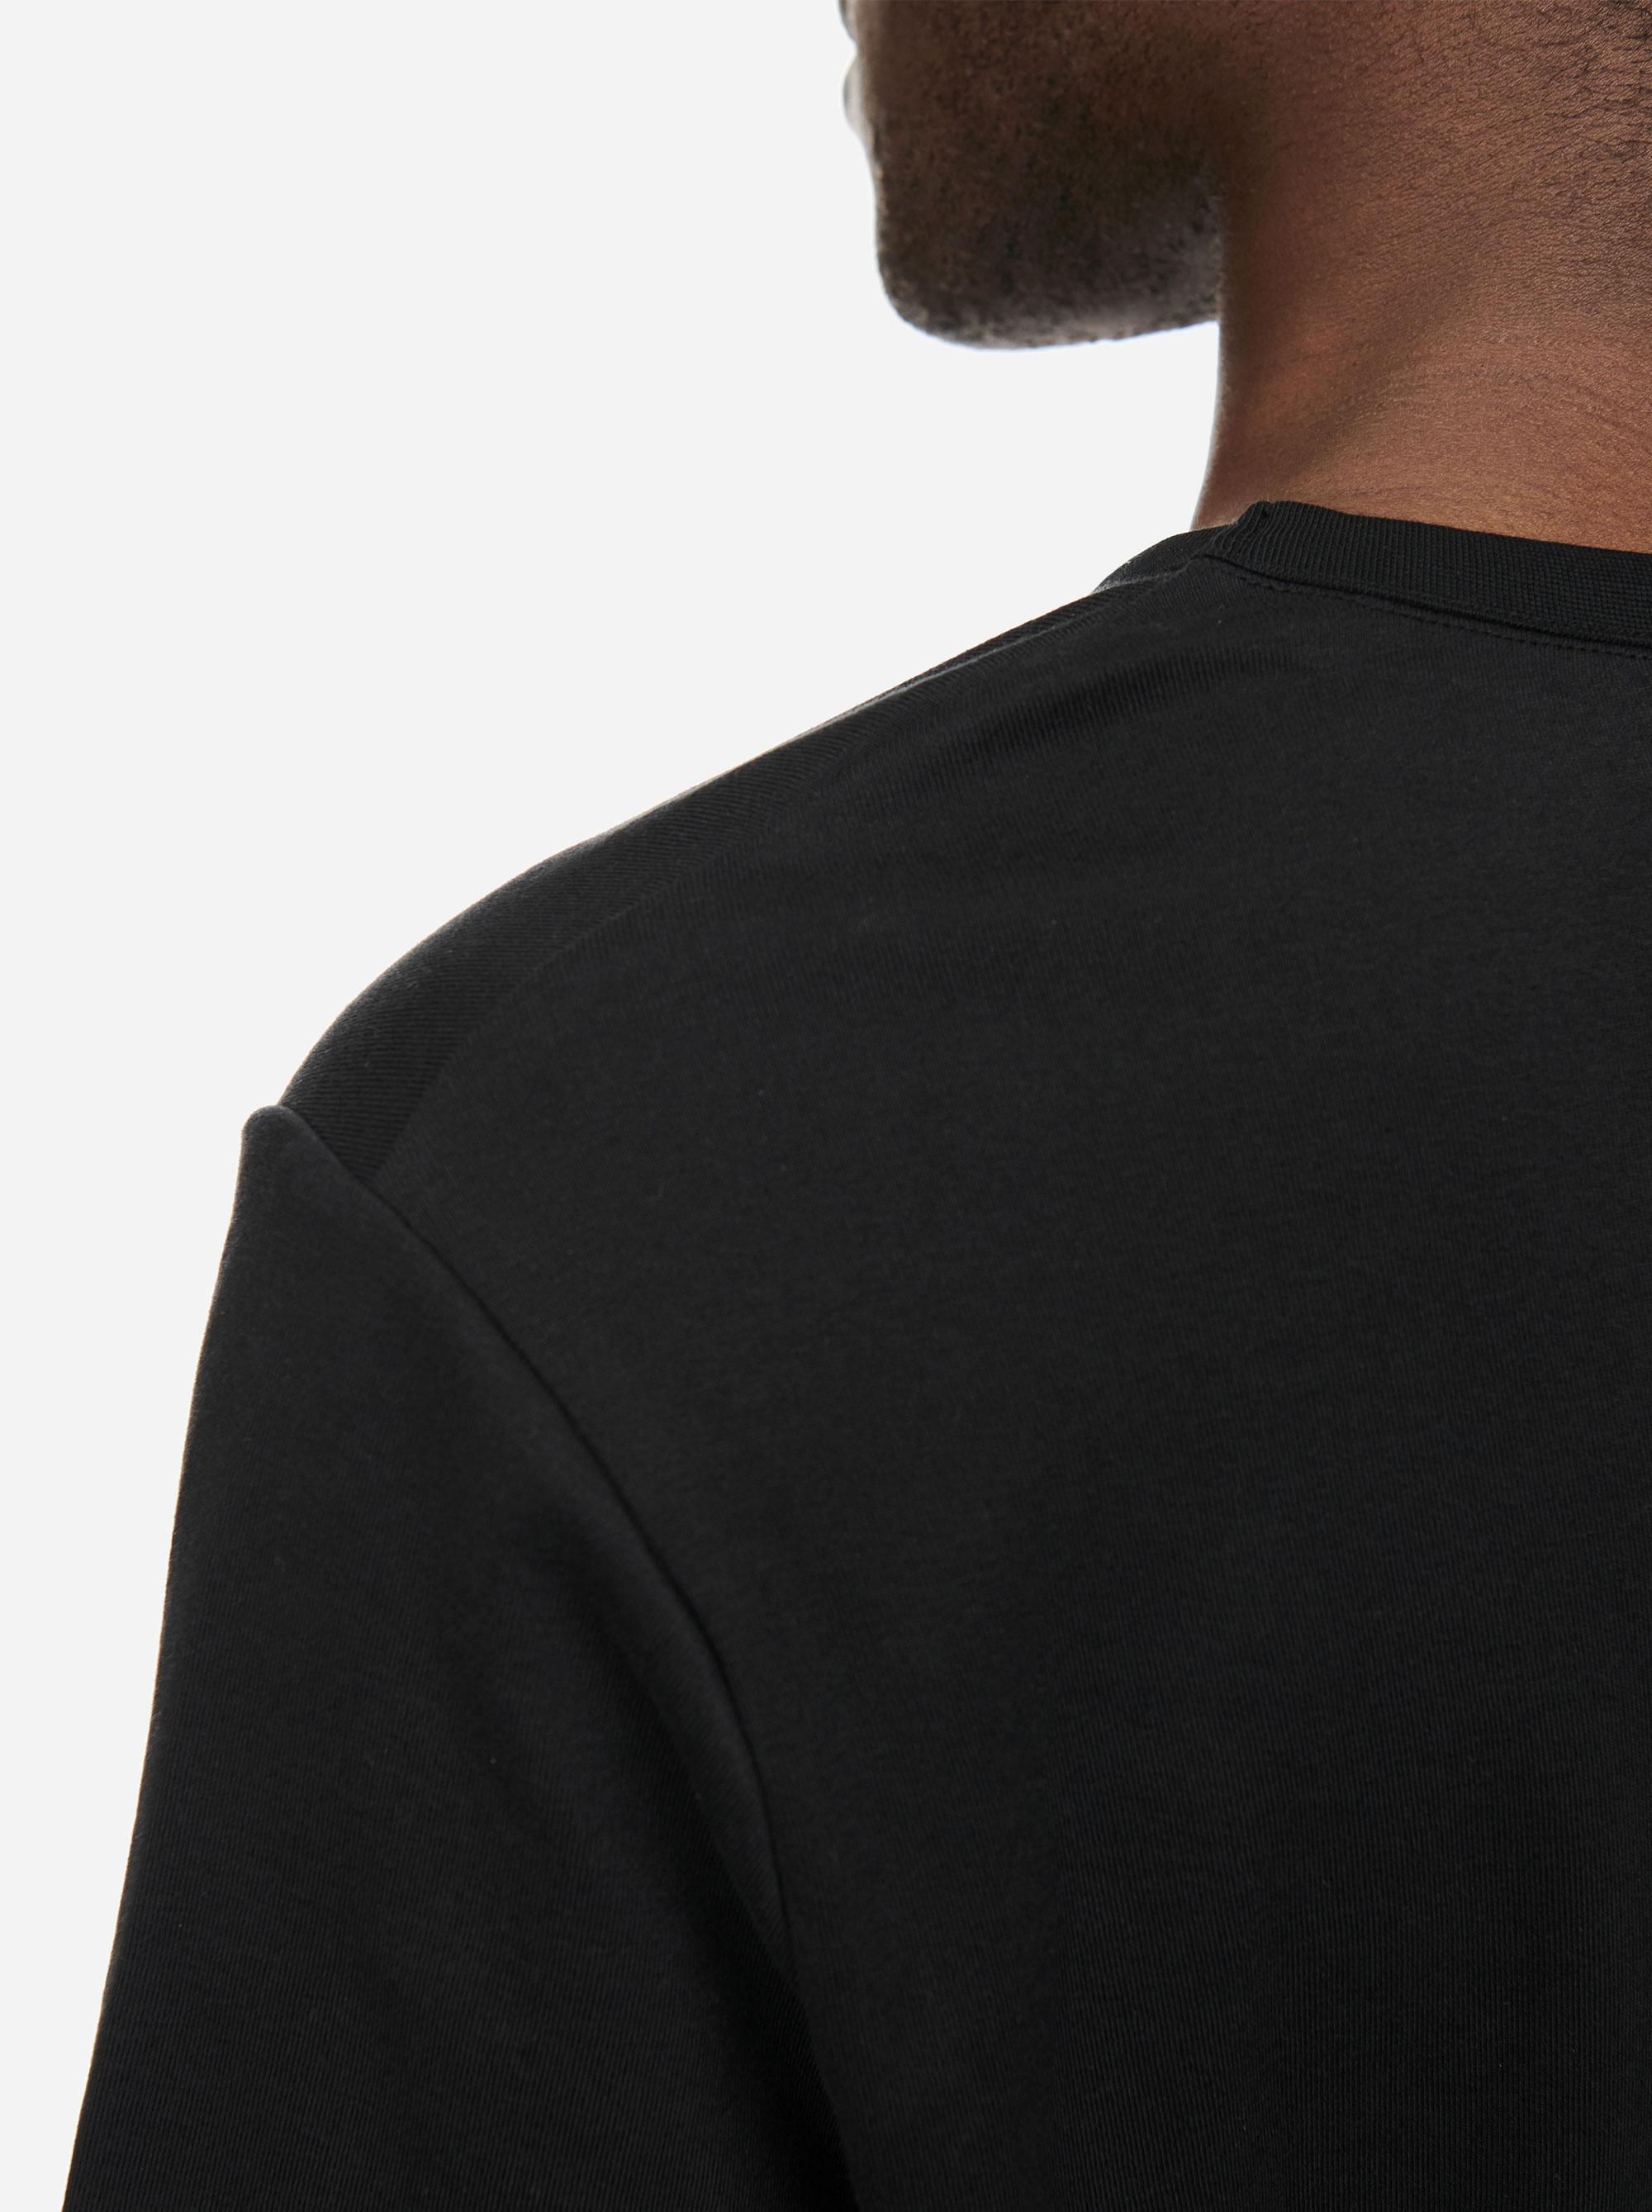 Teym - The T-Shirt - Men - Black - 1